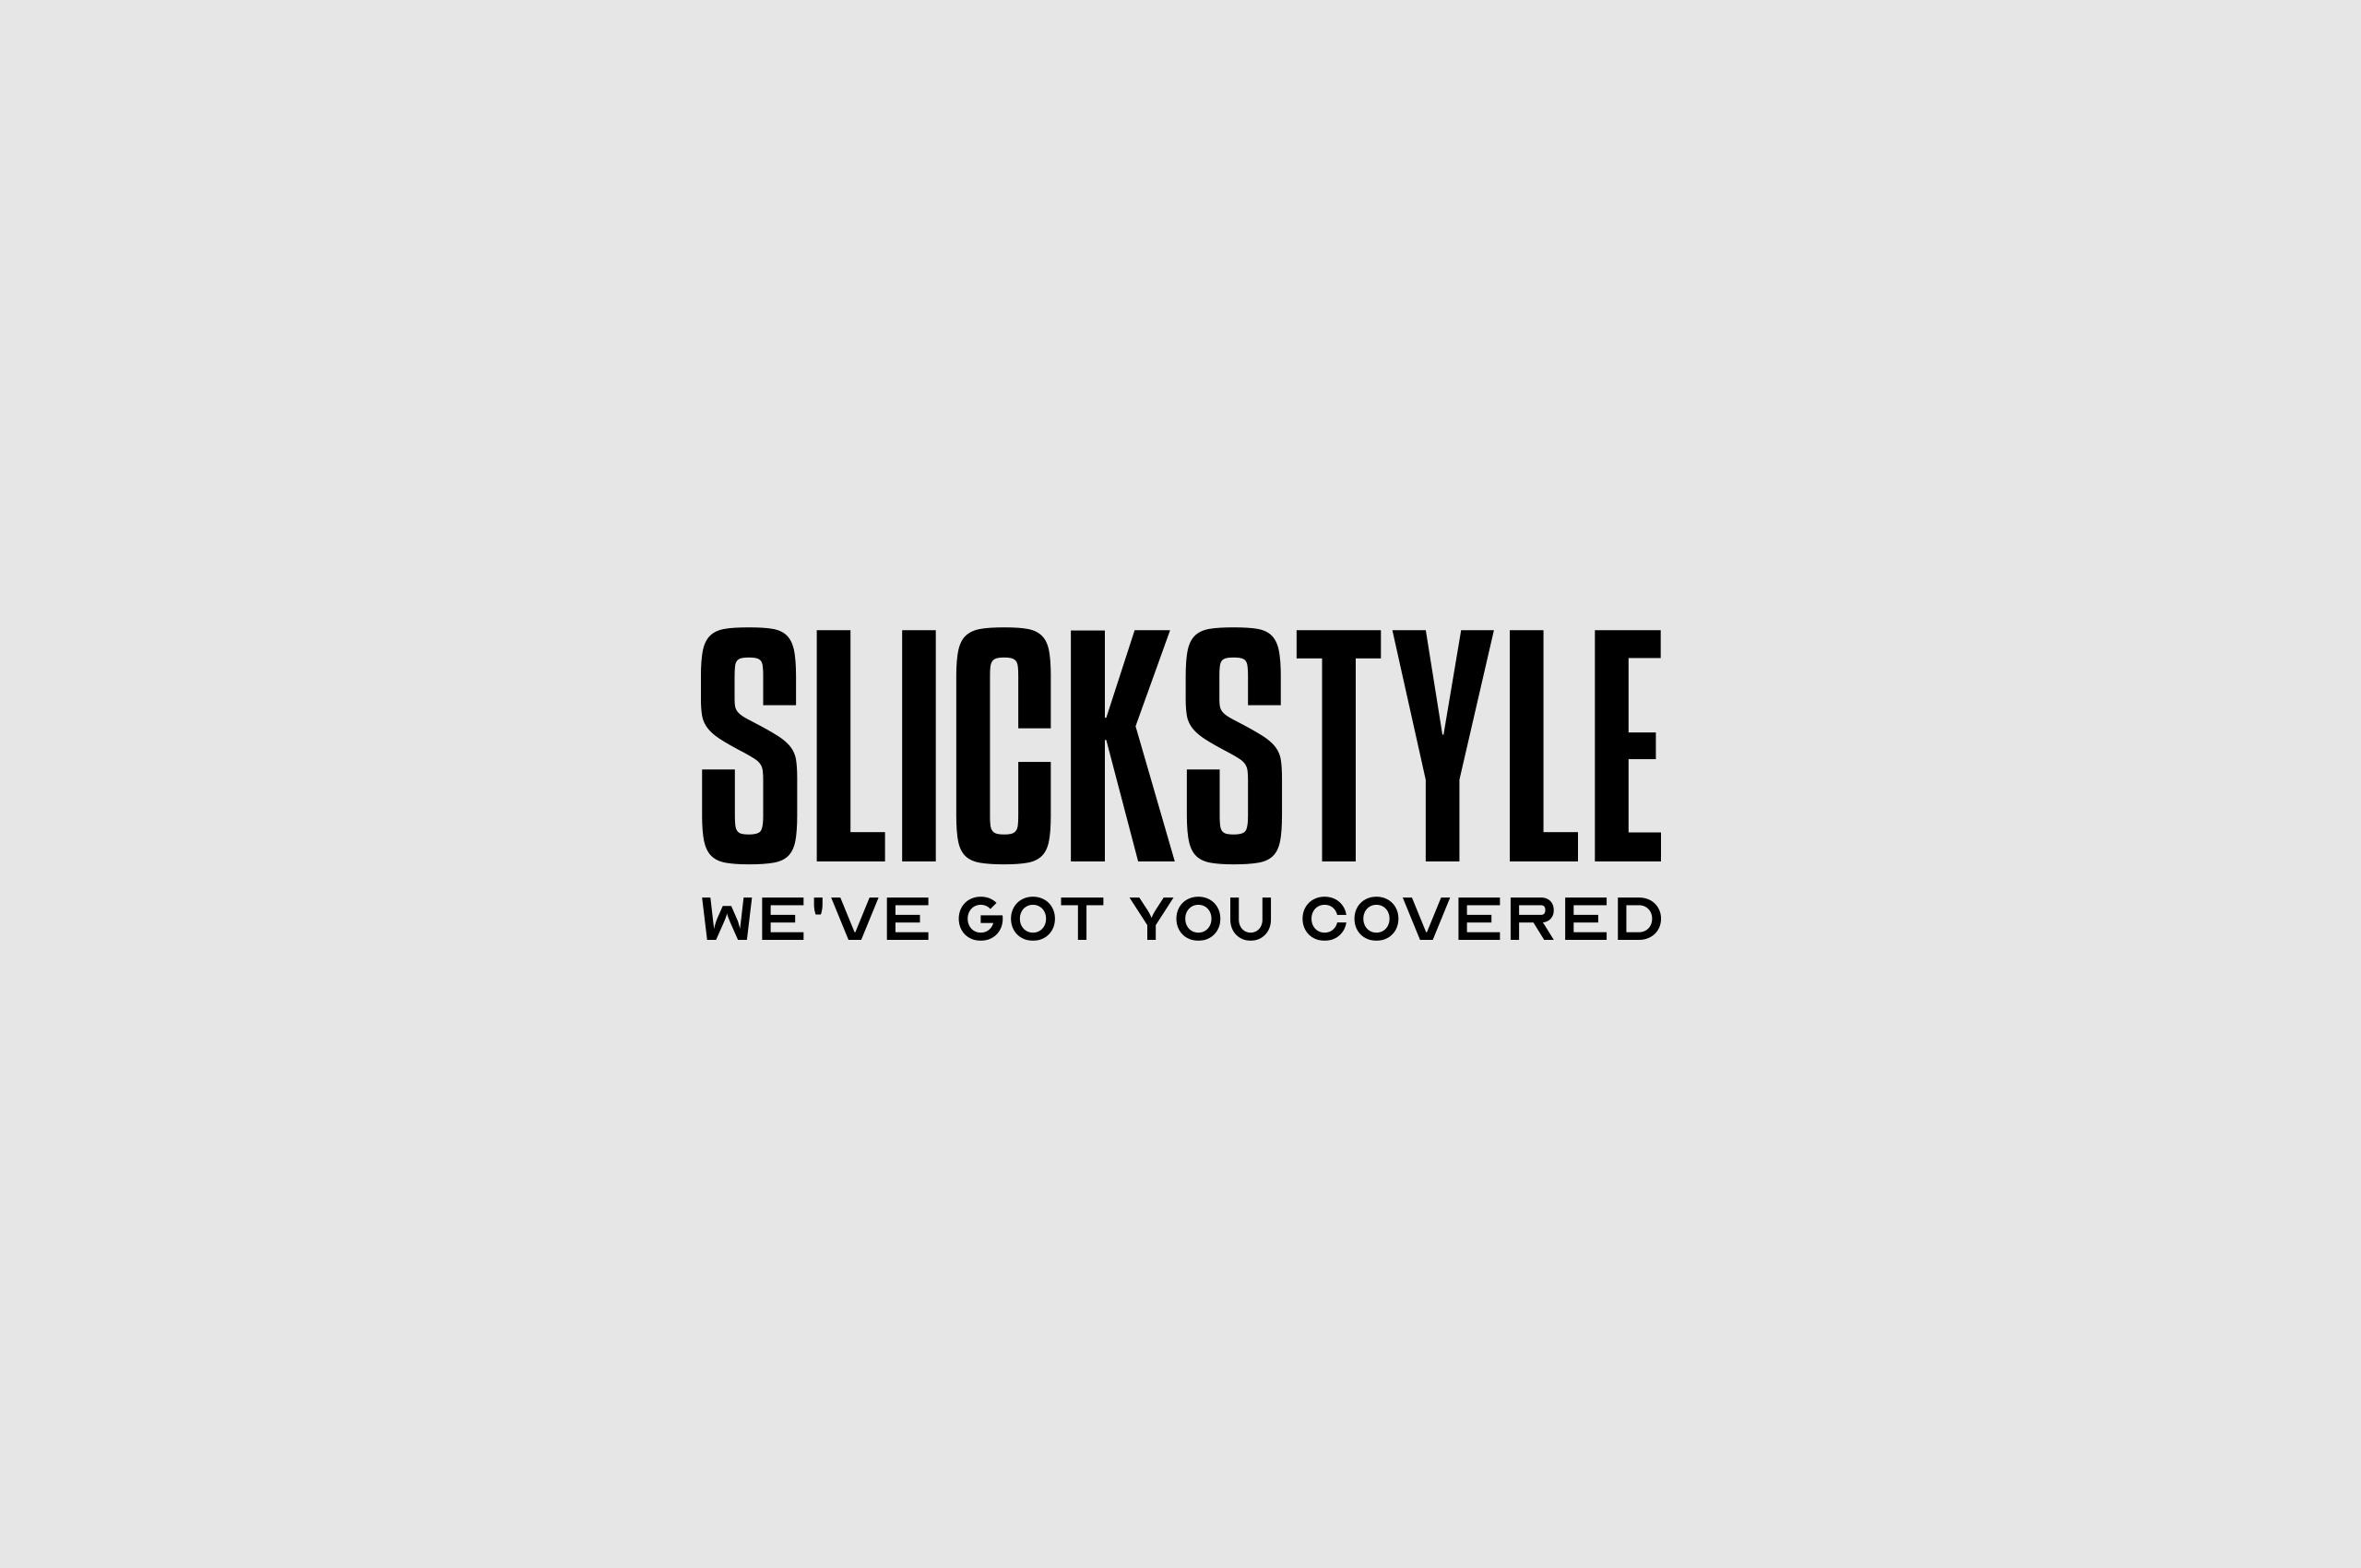 SLICKSTYLE-2a